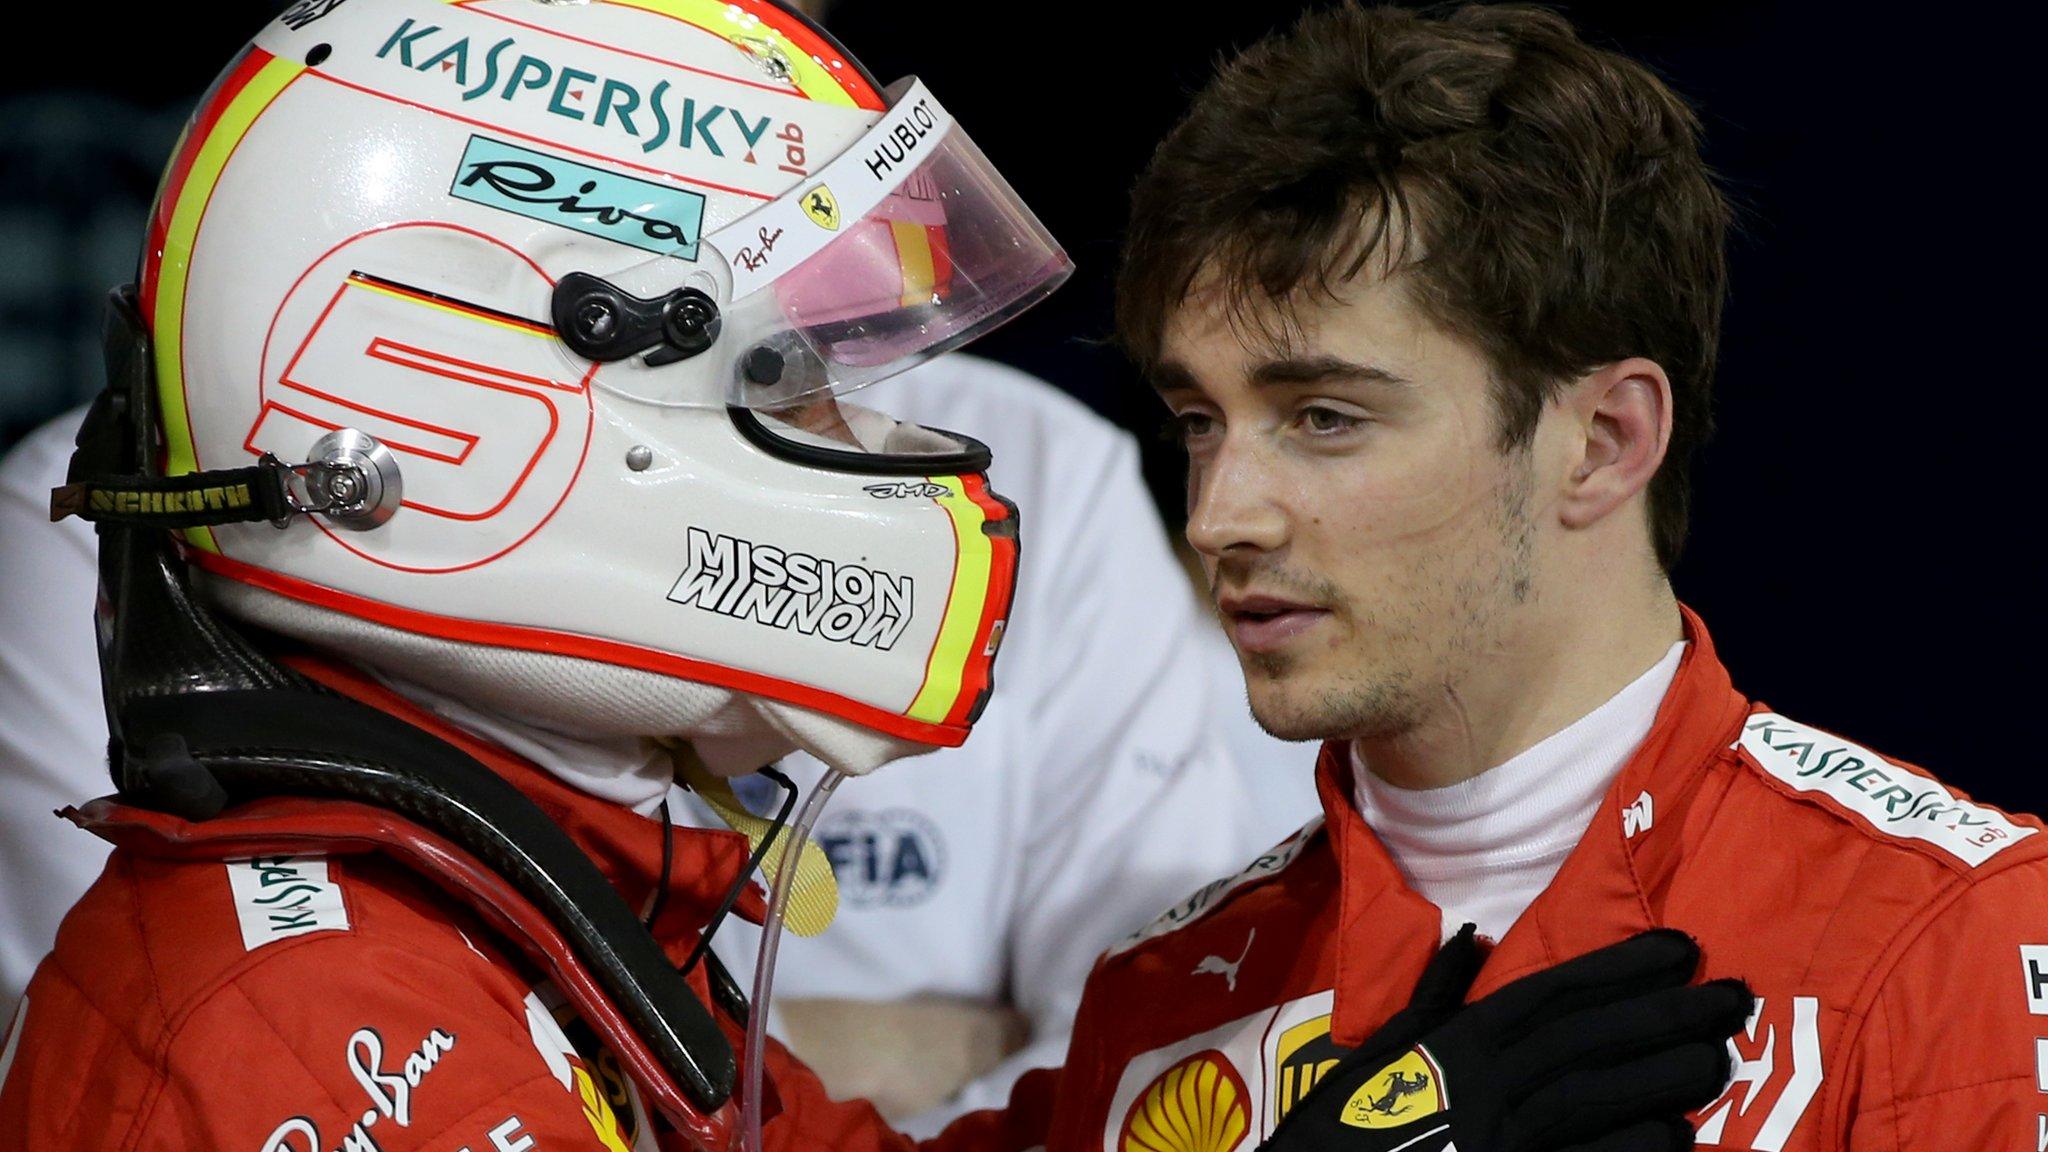 First three GPs 'definitely didn't go the way we wanted': Ferrari seek improvement in Baku